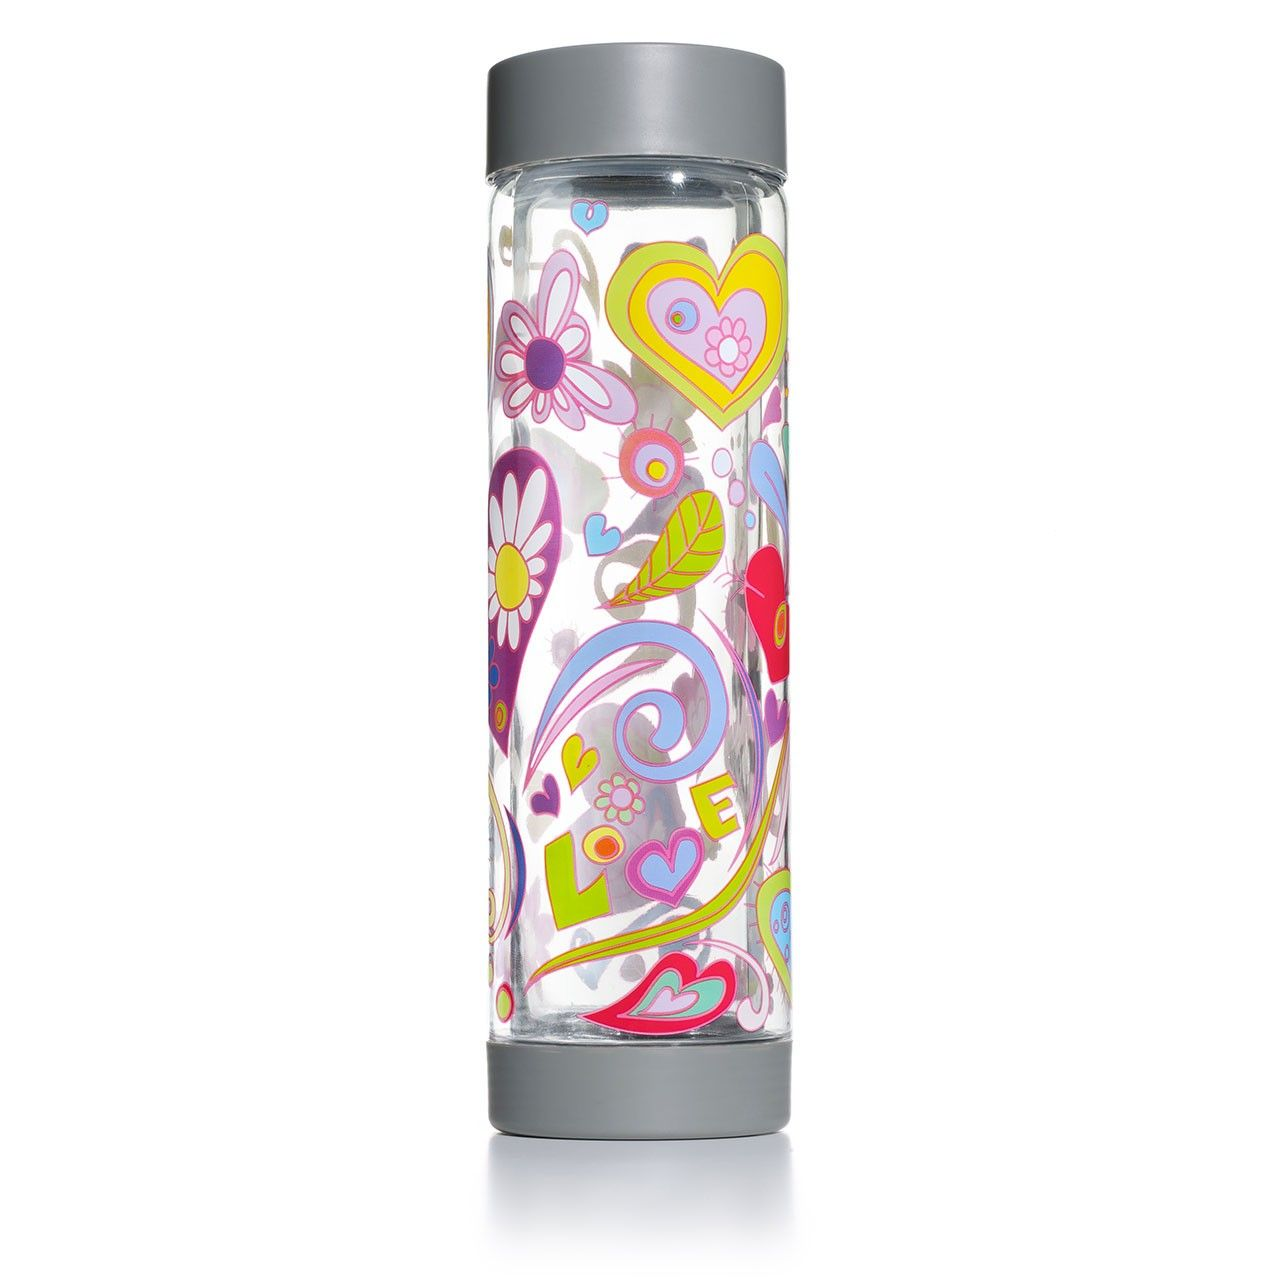 Glasstic Bottle Co. - Glasstic BPA Free Glass Water Bottle - Love Design, $24.99 (http://www.glassticbottle.com/glasstic-bpa-free-glass-water-bottle-love-design/)